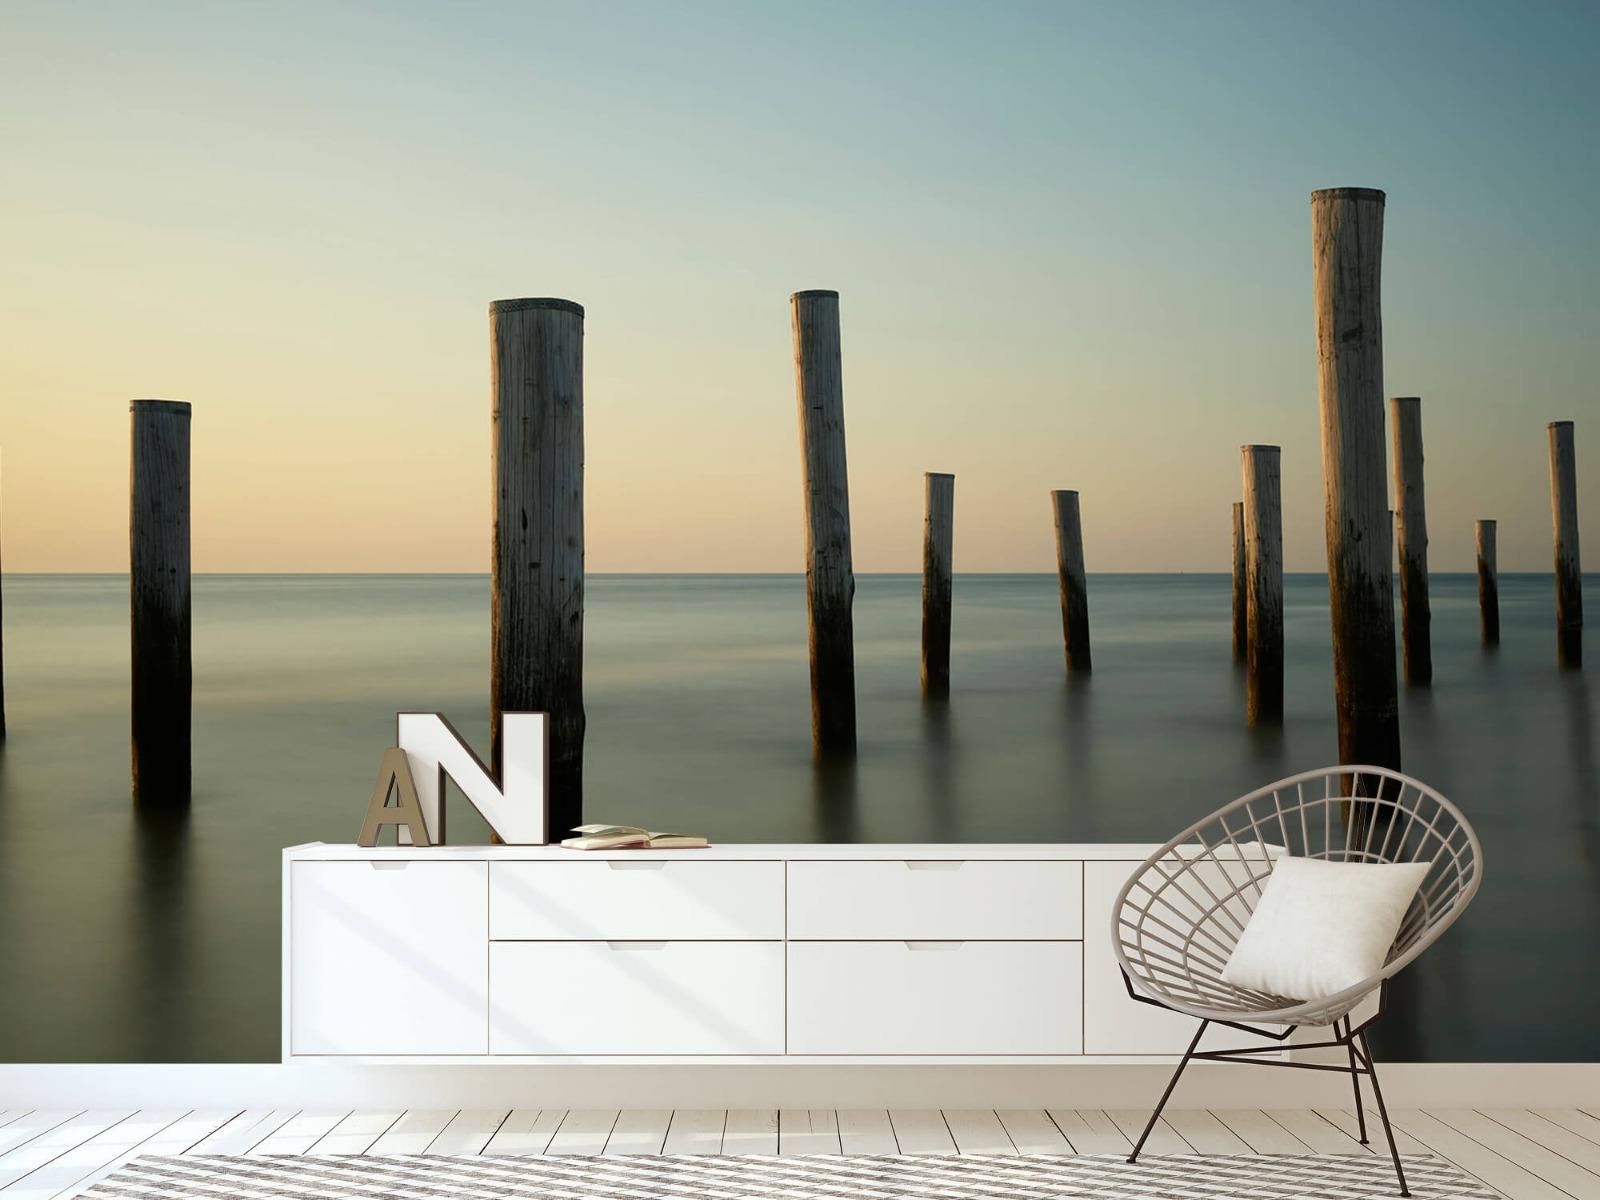 Zeeën en Oceanen - Houten strandpalen - Slaapkamer 23